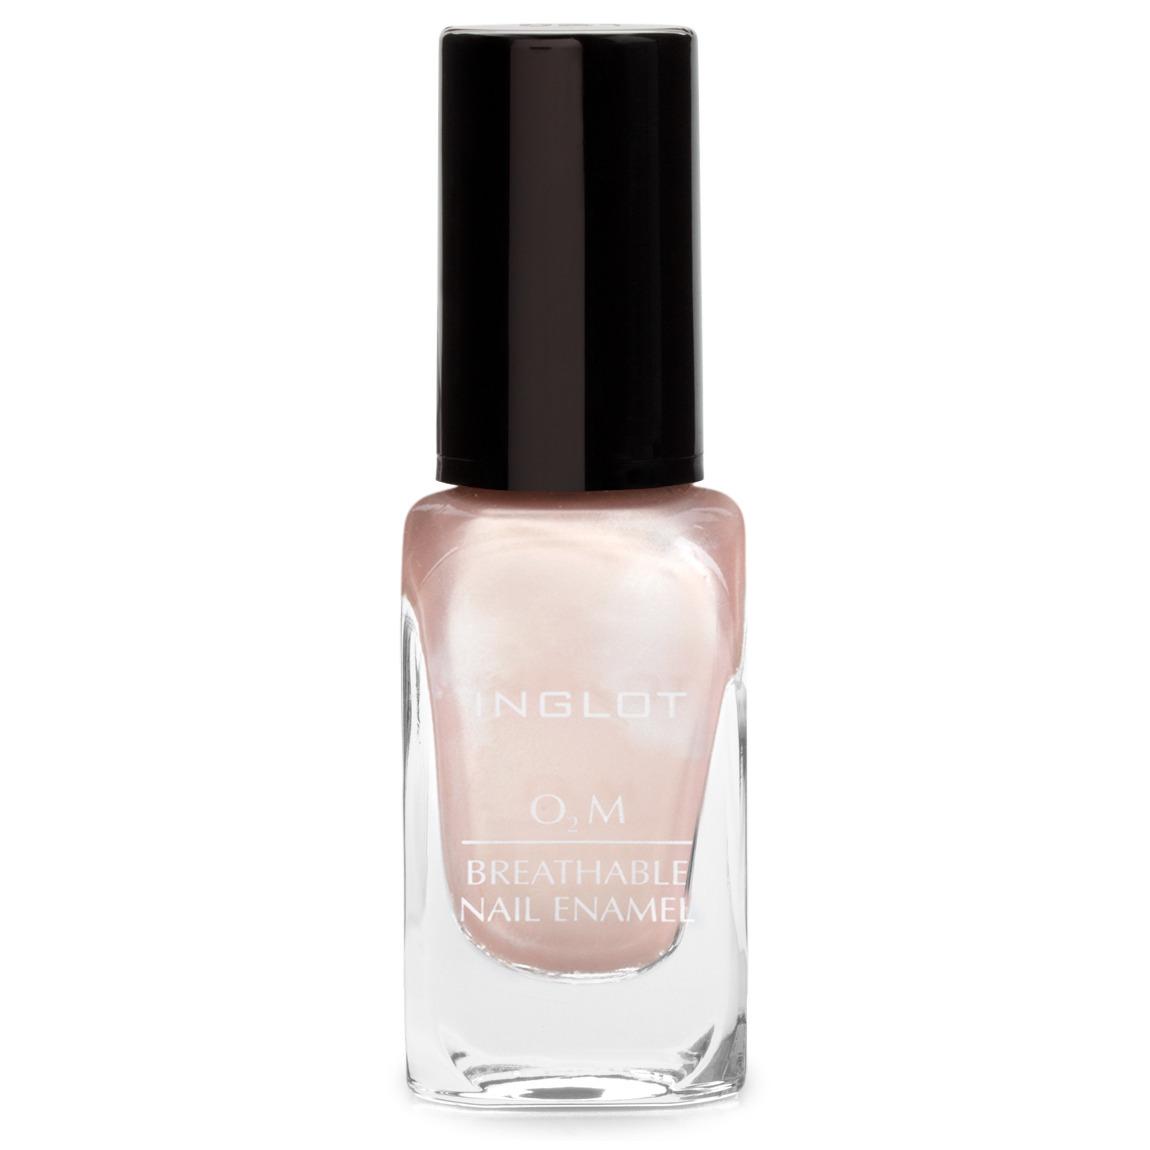 Inglot Cosmetics O2M Breathable Nail Enamel 630